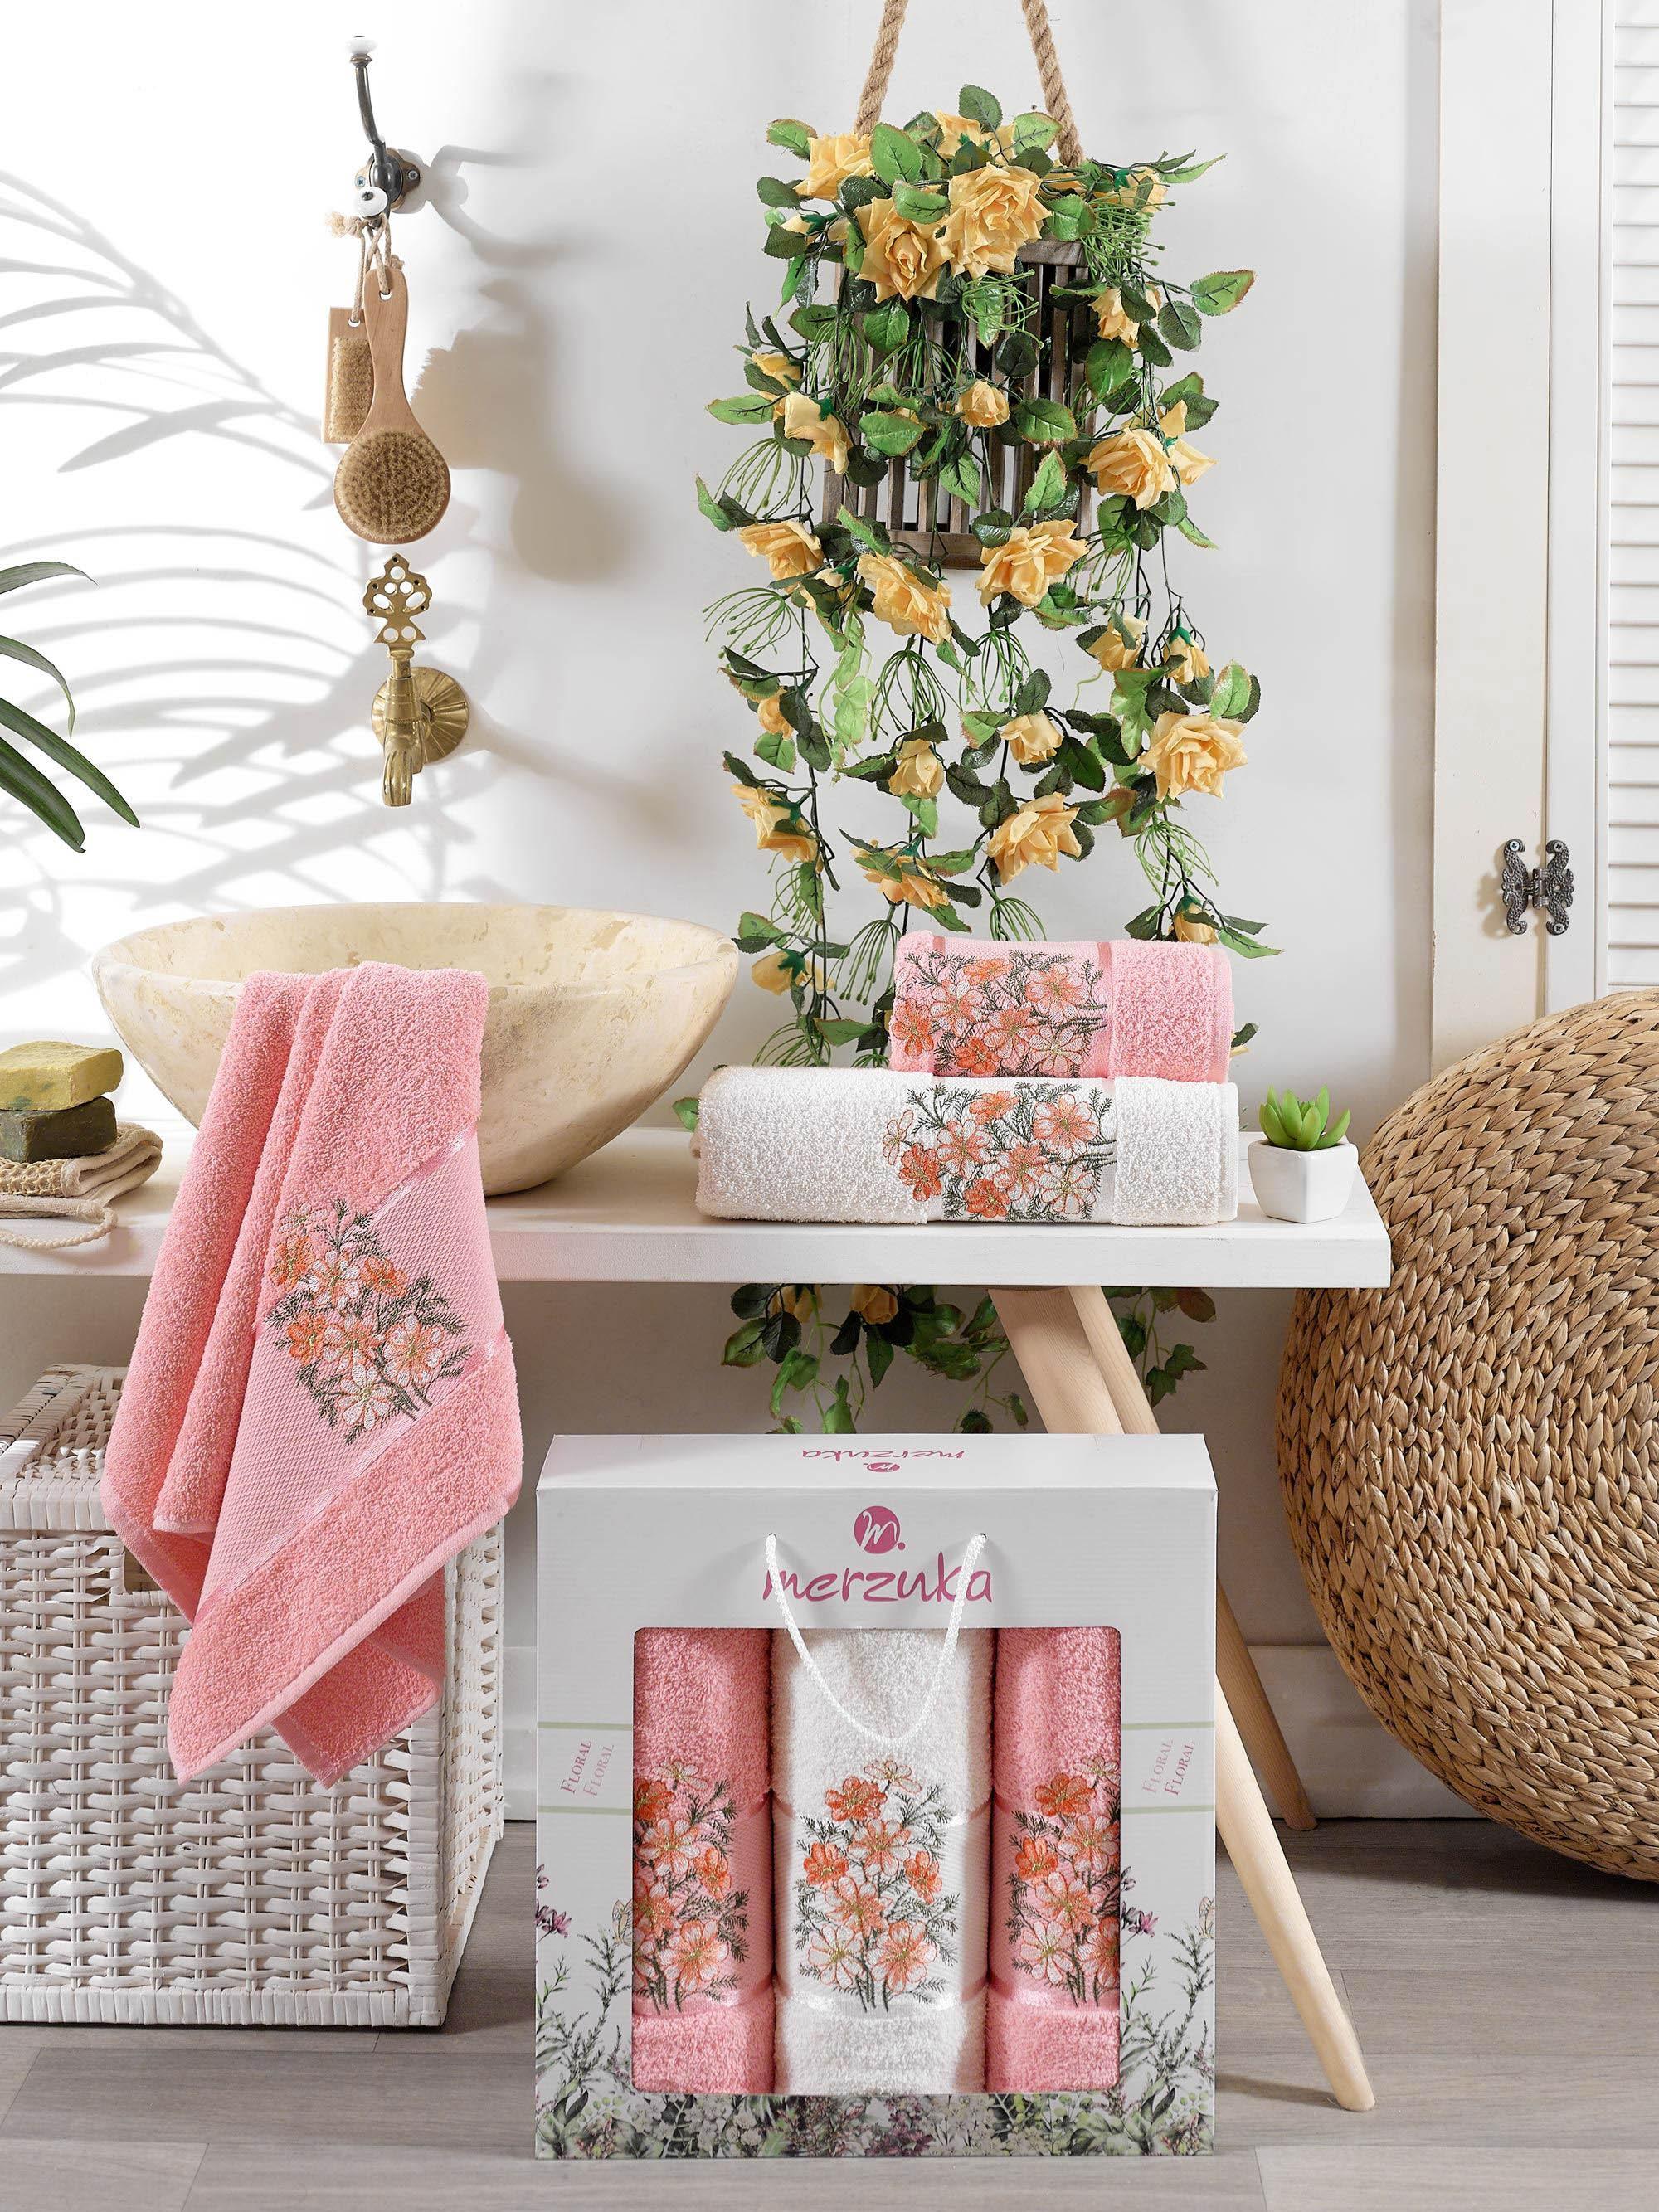 Полотенца Oran Merzuka Полотенце Floral Цвет: Оранжевый (50х80 см - 2 шт,70х130 см) оранжевый prime м 50х90 70х130 в коробке набор полотенец фиеста